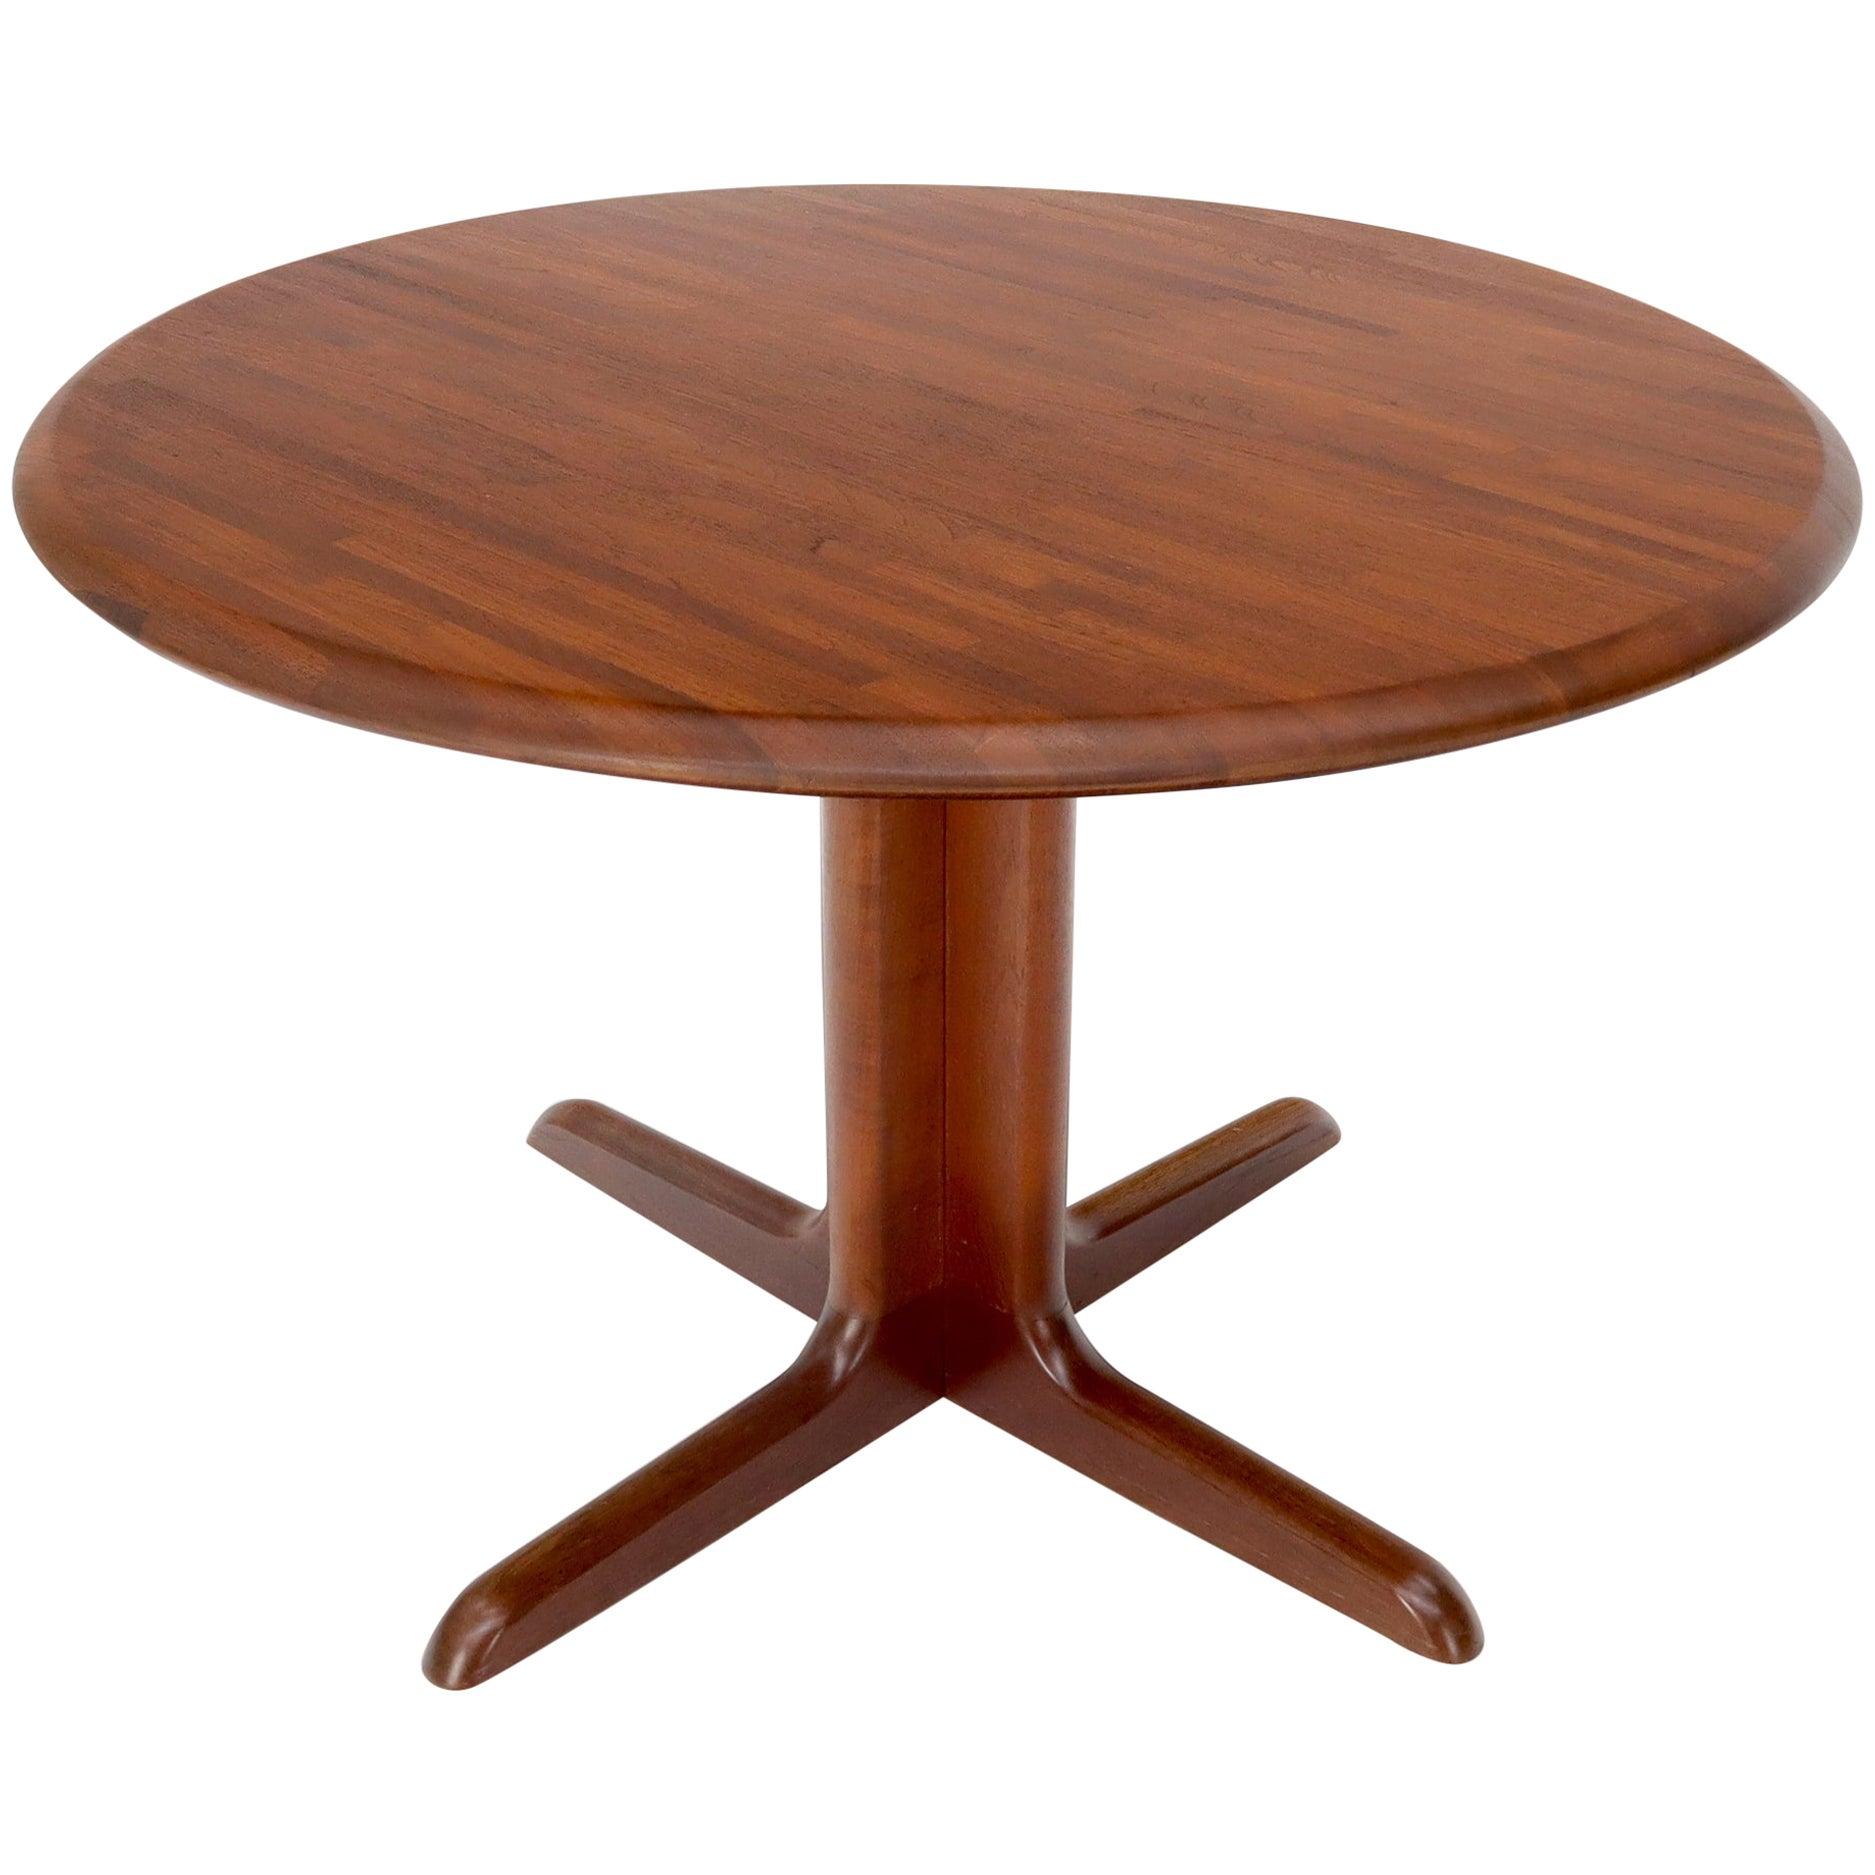 Solid Teak Danish Mid-Century Modern Round Dining Dinette Table